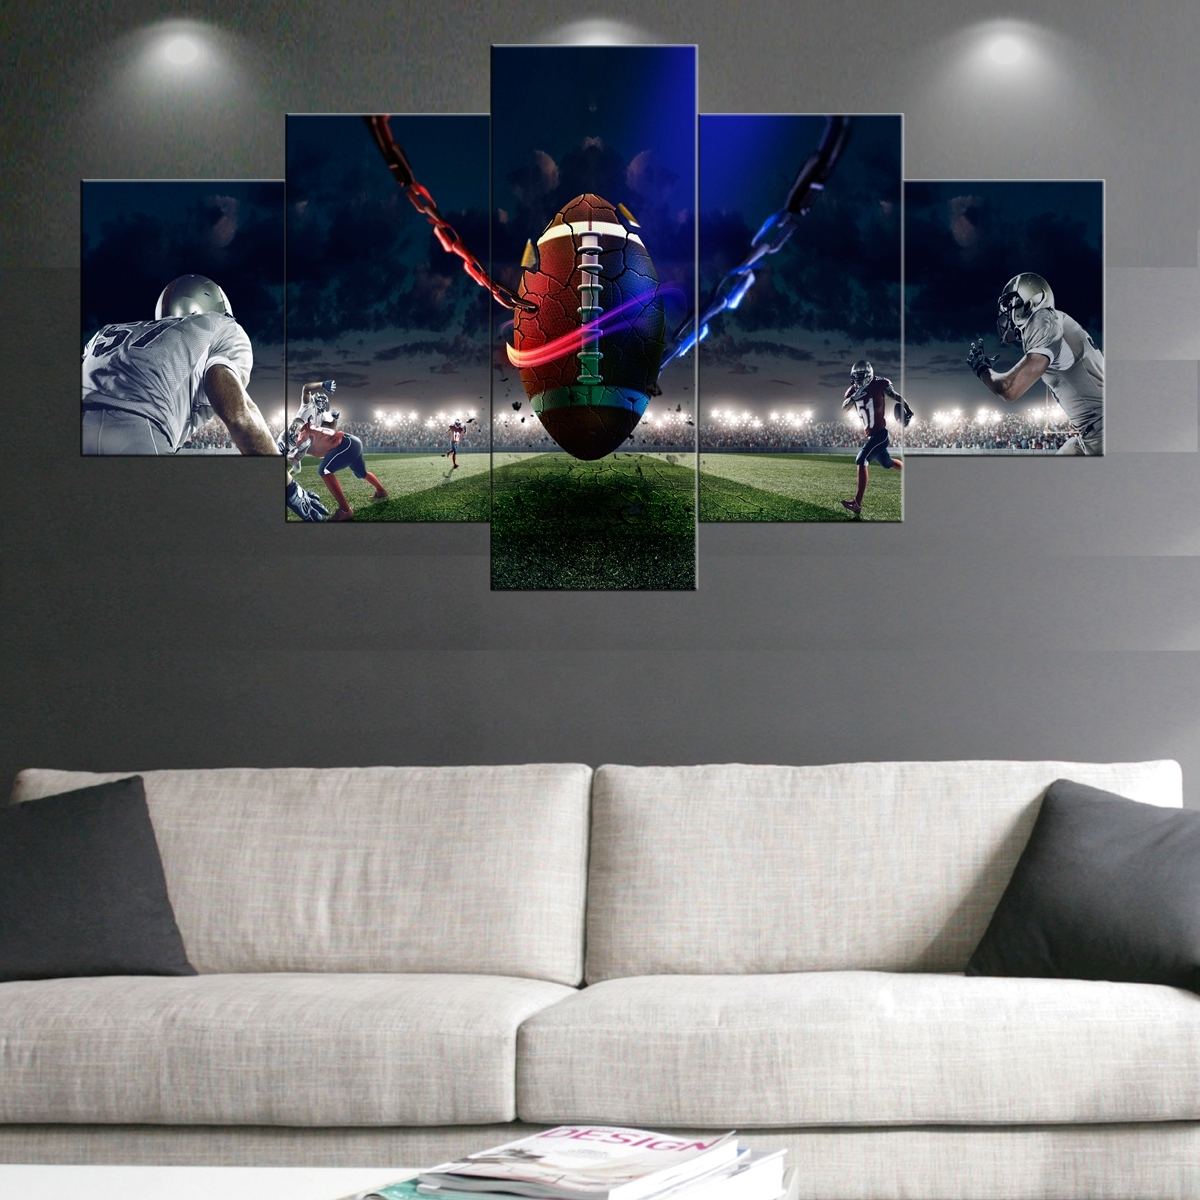 Beautifully Idea Sports Canvas Wall Art – Ishlepark For Sports Wall Art (View 5 of 20)